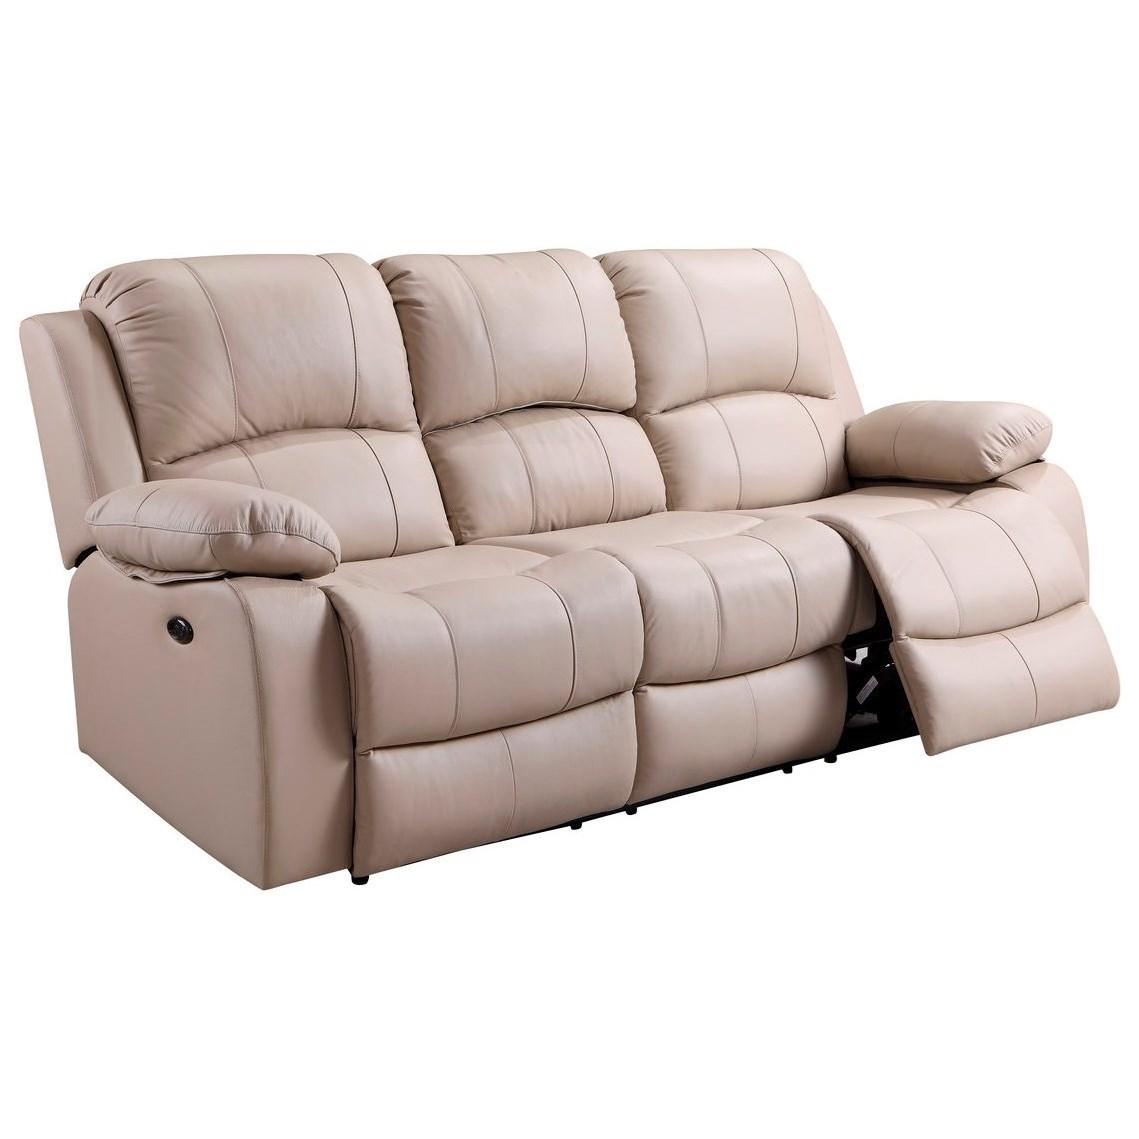 Leather Italia Usa Winnfield Leather Power Reclining Sofa